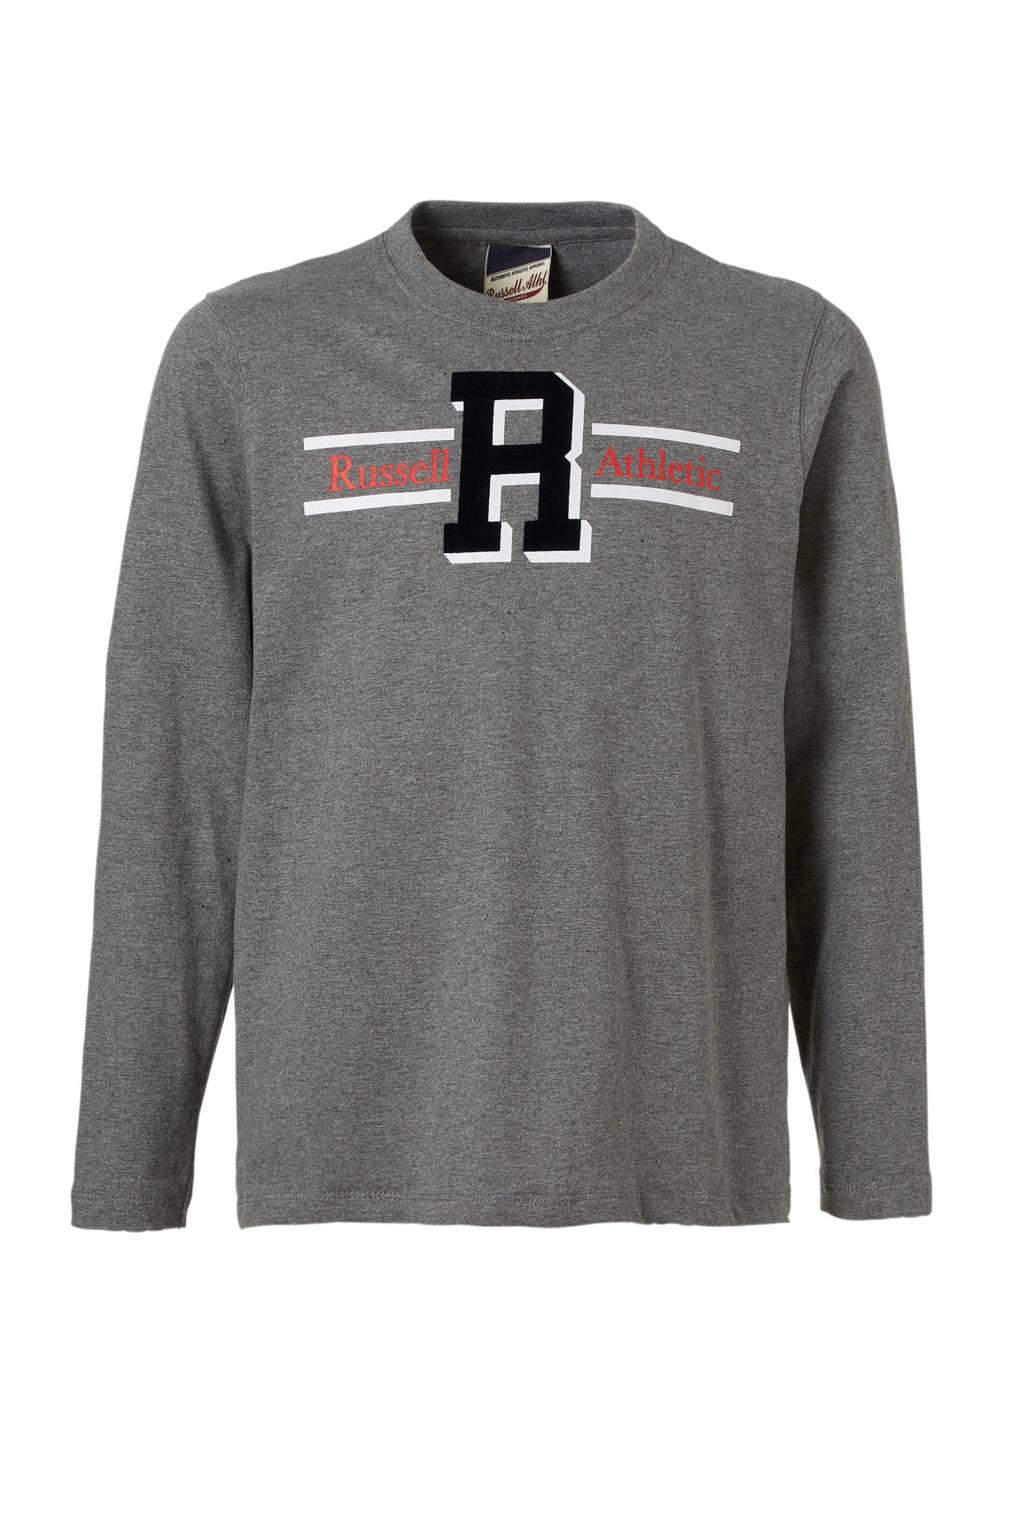 Russell Athletic longsleeve grijs melange, Grijs melange/wit/rood